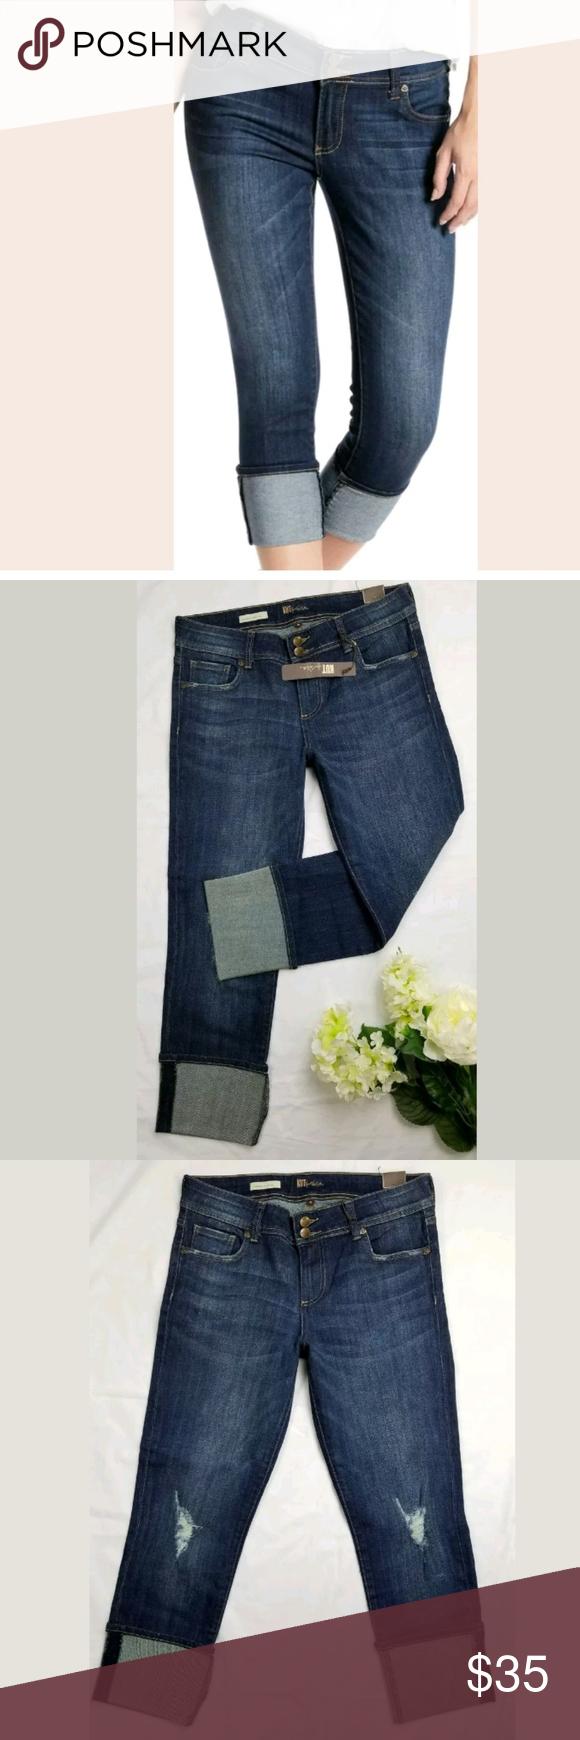 Kut From Kloth Stitch Fix Cropped Slim Jeans Nwt Slim Jeans Blue Fashion Cuffed Jeans